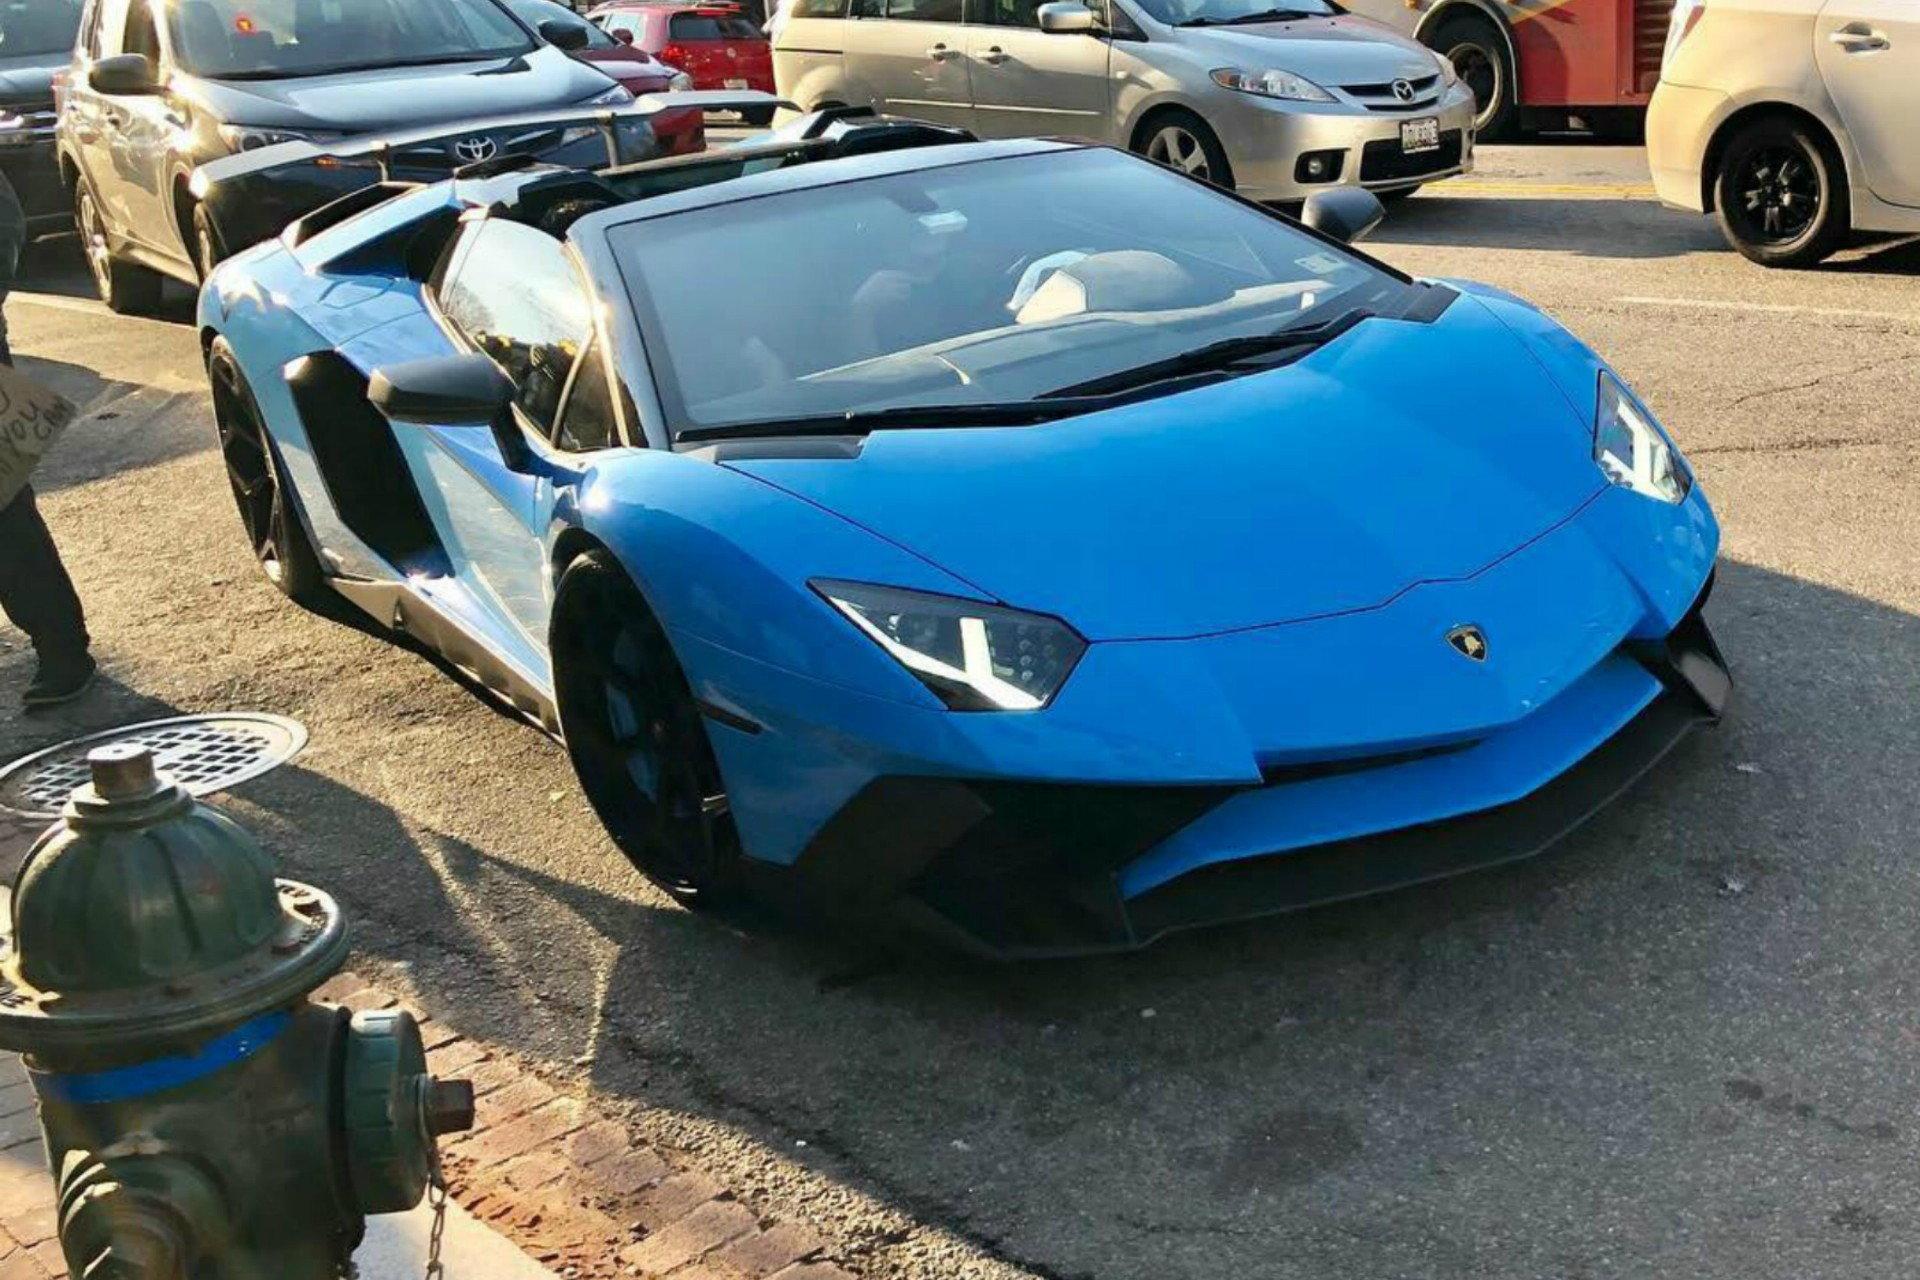 Baby Blue Lamborghini Aventador Lp 750 4 Sv Roadster 6speedonline Porsche Forum And Luxury Car Resource